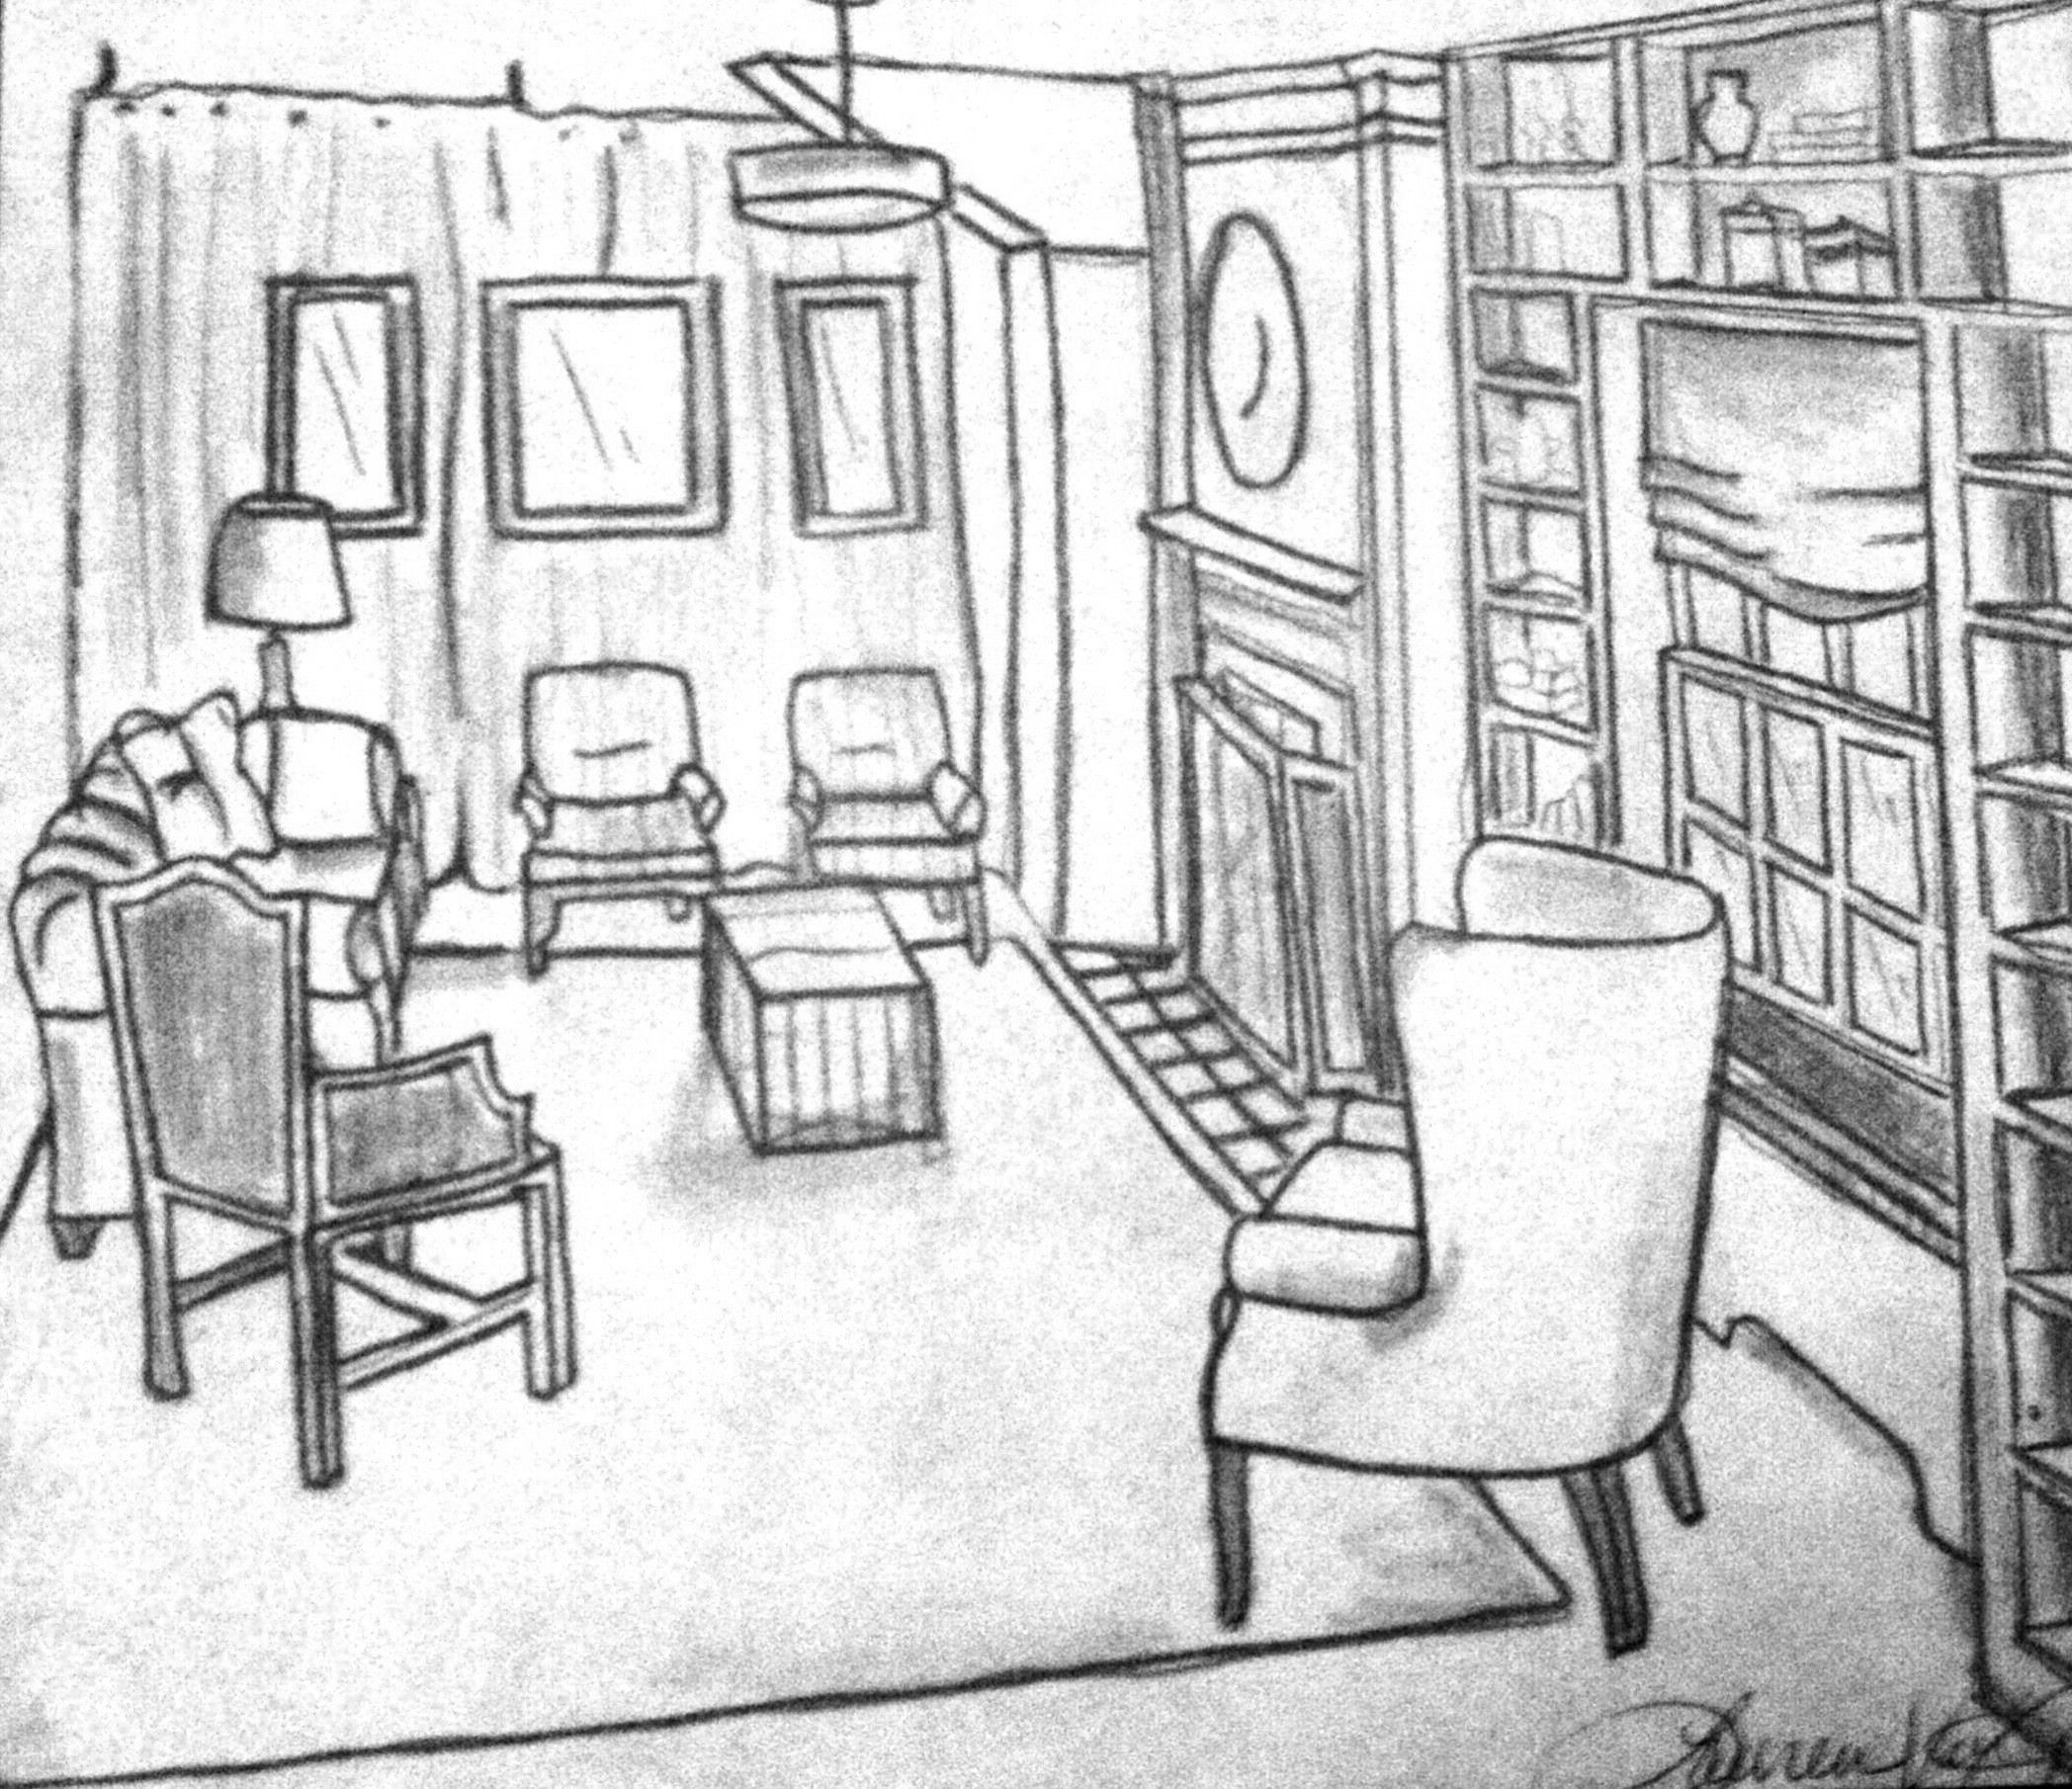 2096x1810 Brilliant Living Room Drawing Sketch 2096 X 1810 837 Kb Jpeg